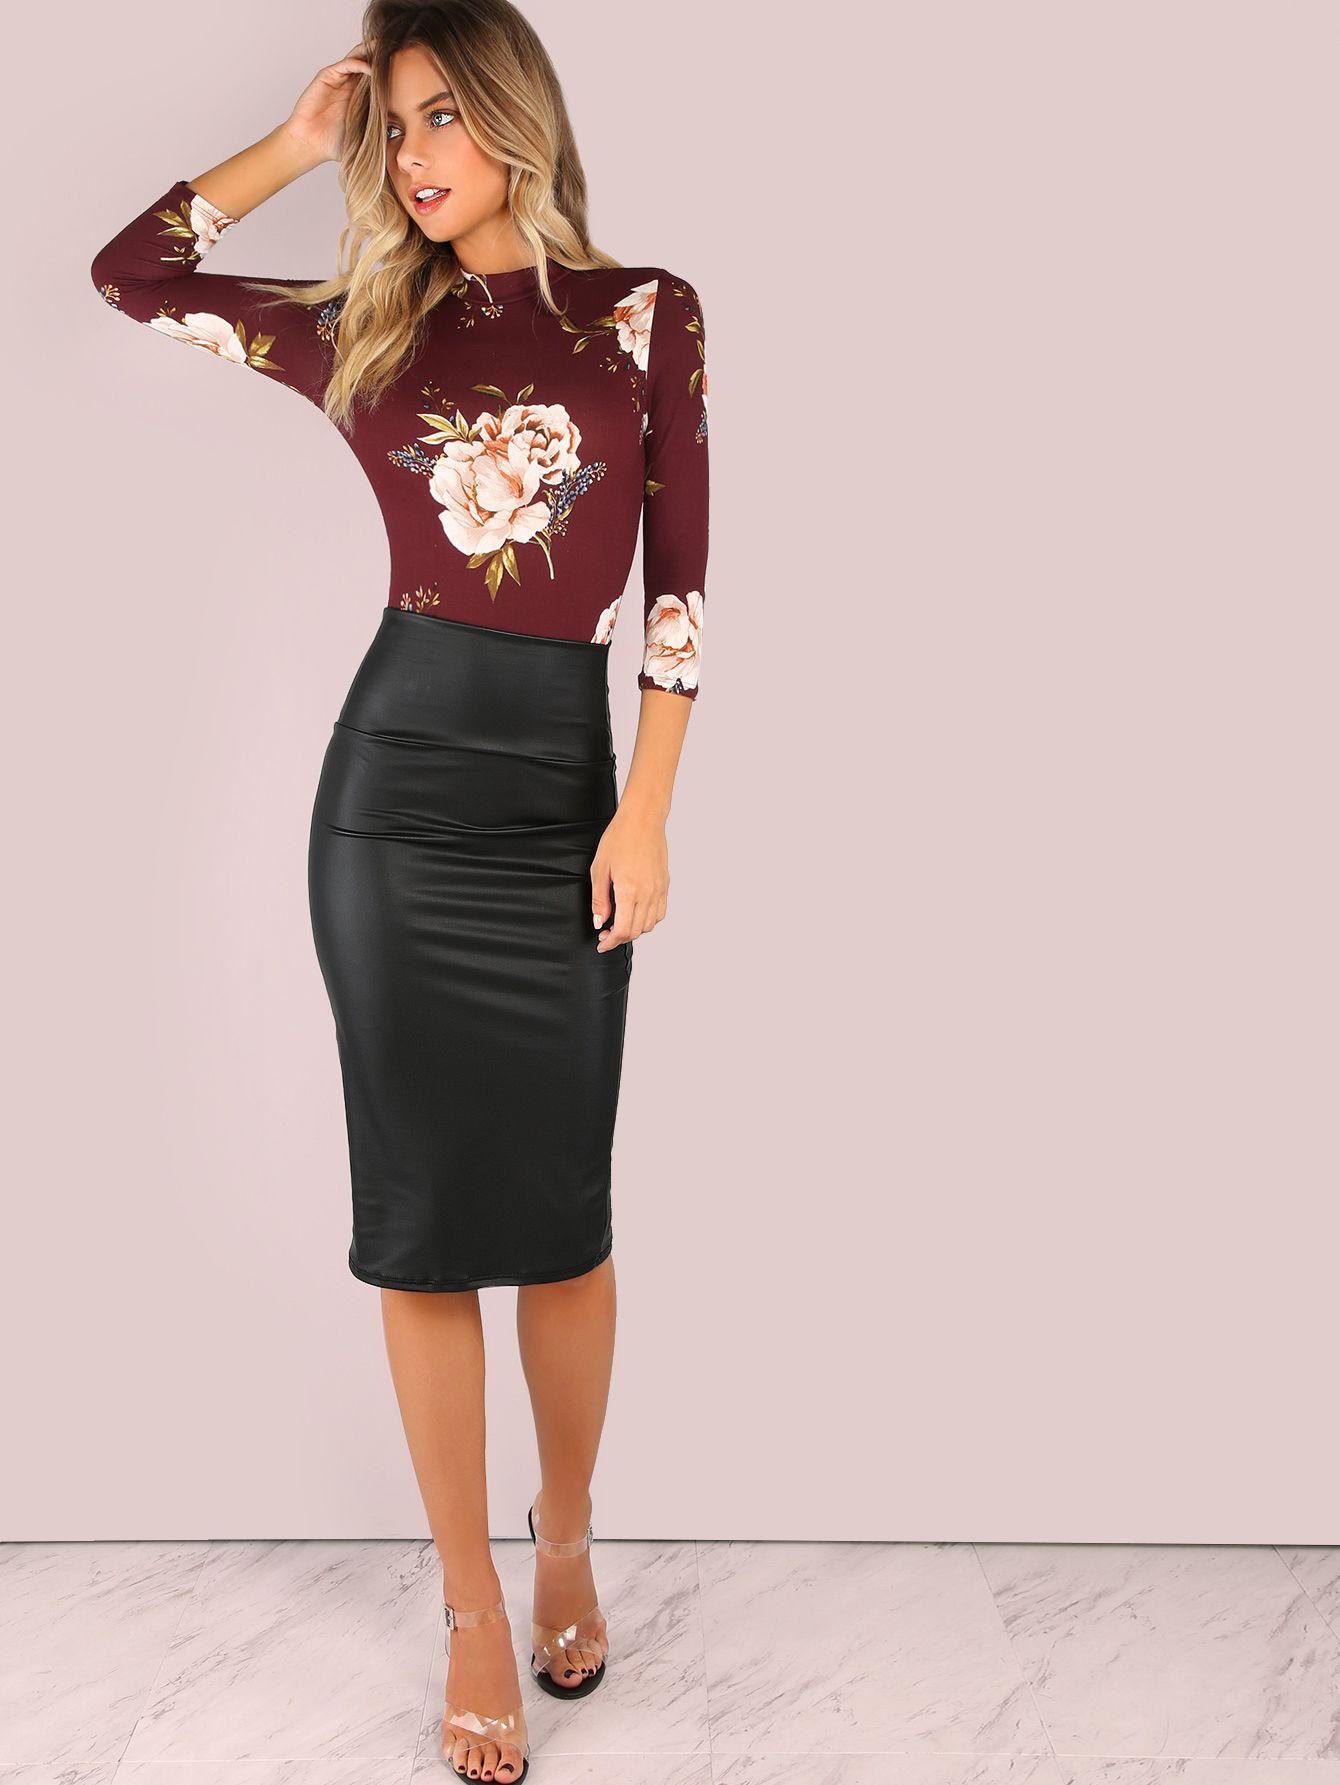 6cfa91e86 Shop Wide Waistband Coated Pencil Skirt BLACK online. SheIn offers Wide  Waistband Coated Pencil Skirt